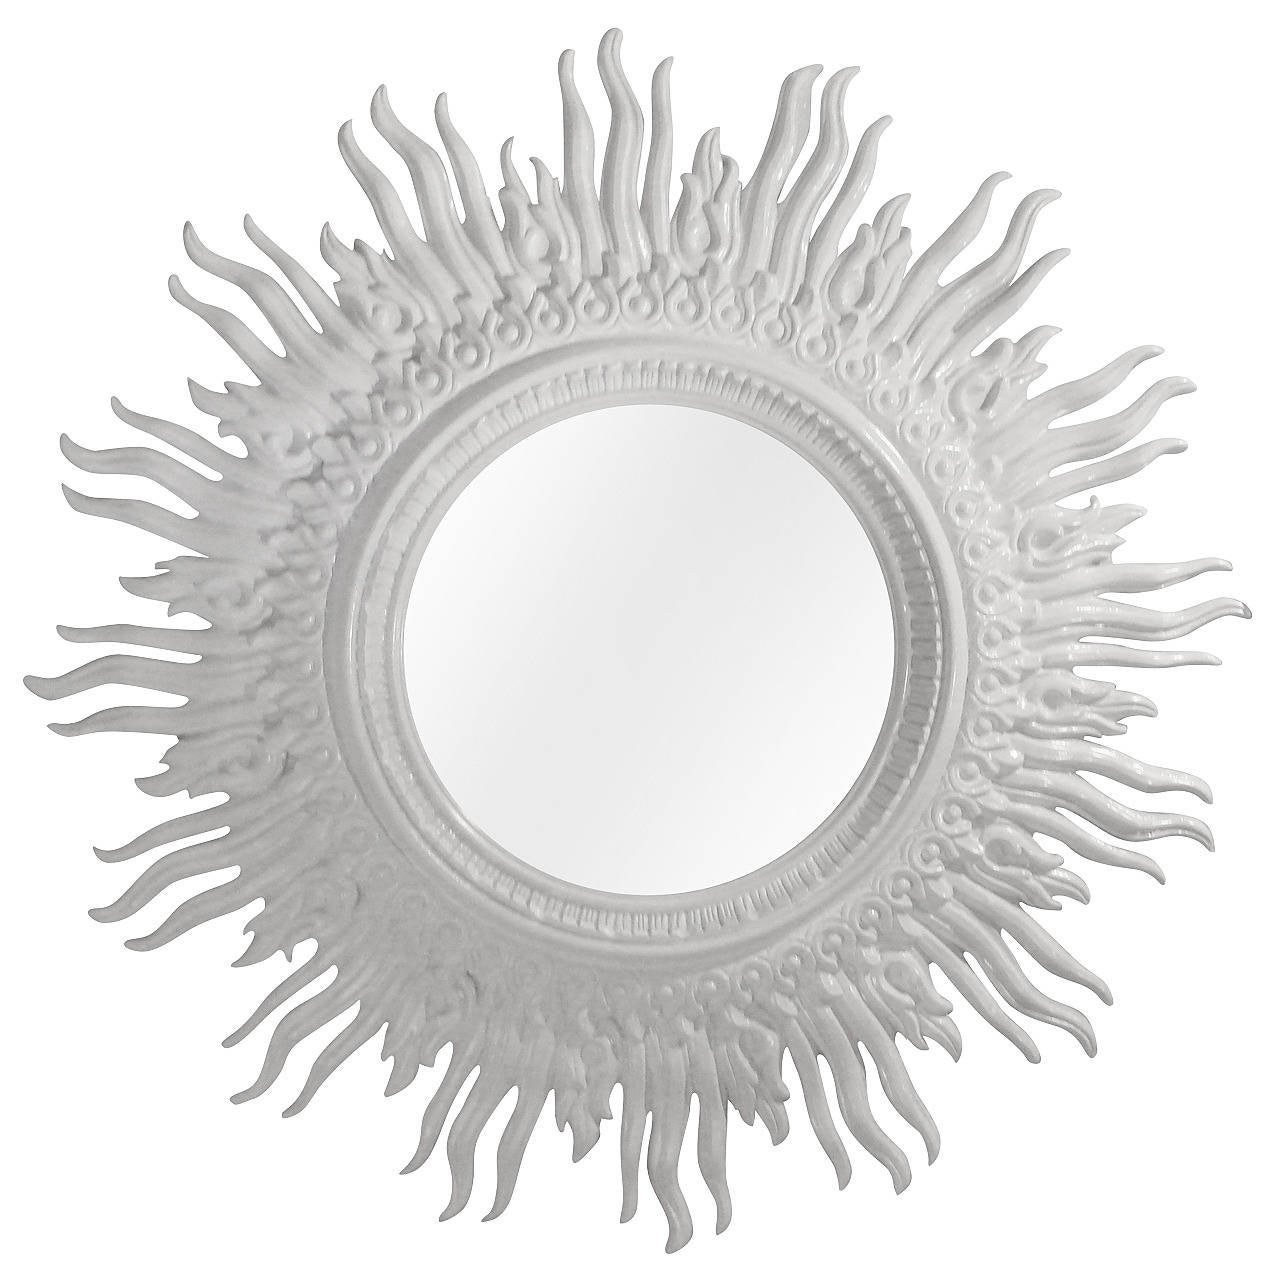 White gloss vintage sunburst mirror at 1stdibs for Sunburst mirror